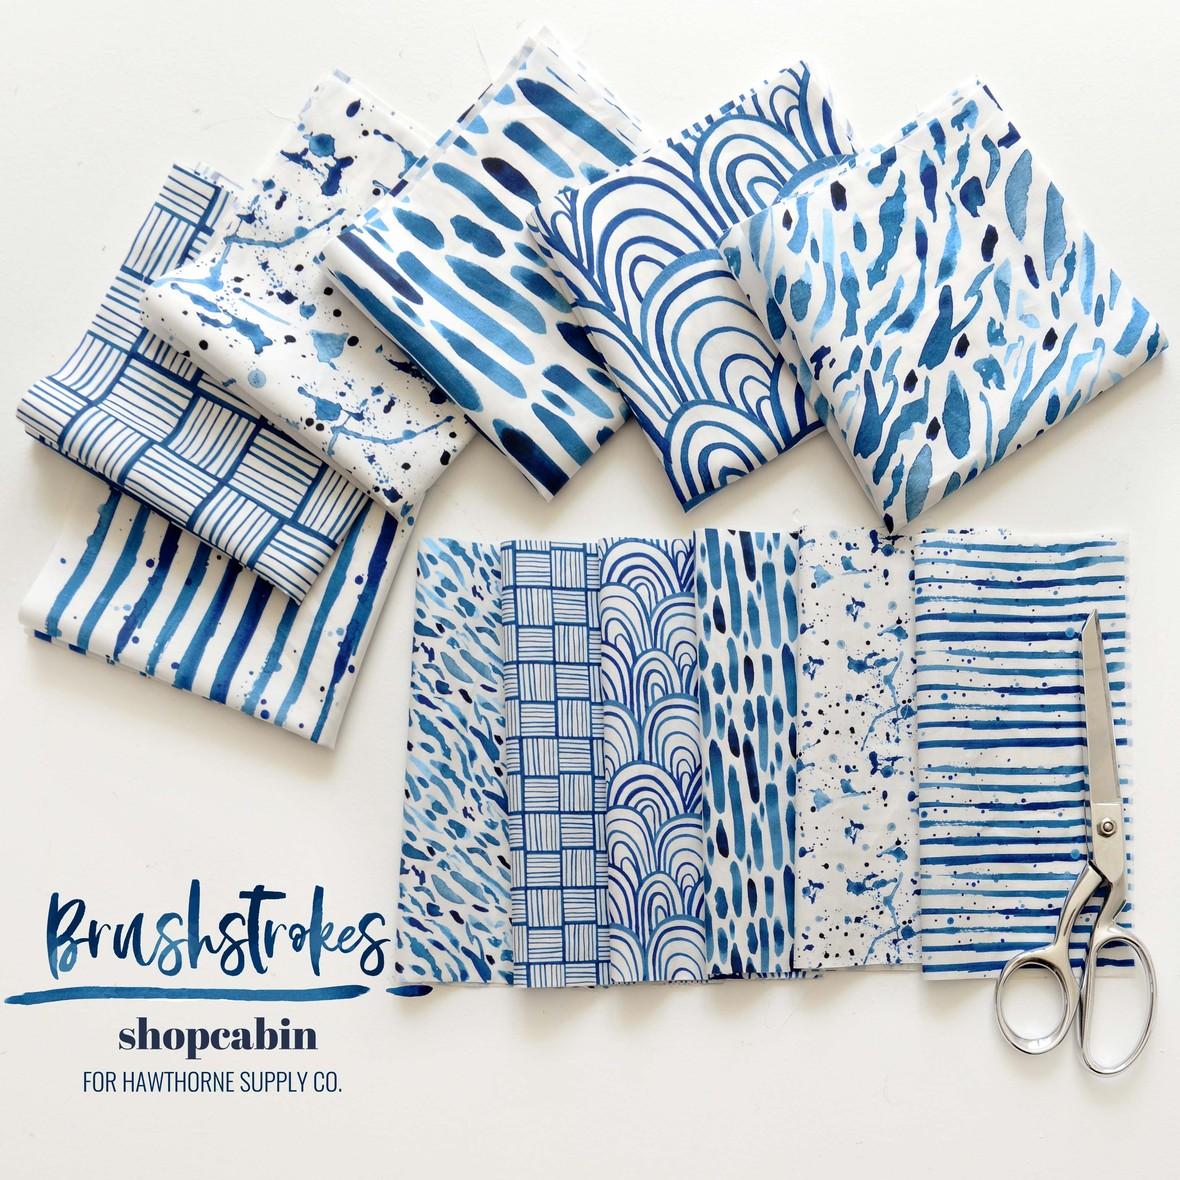 Brustrokes Fabric Shopcabin at Hawthorne Supply Co